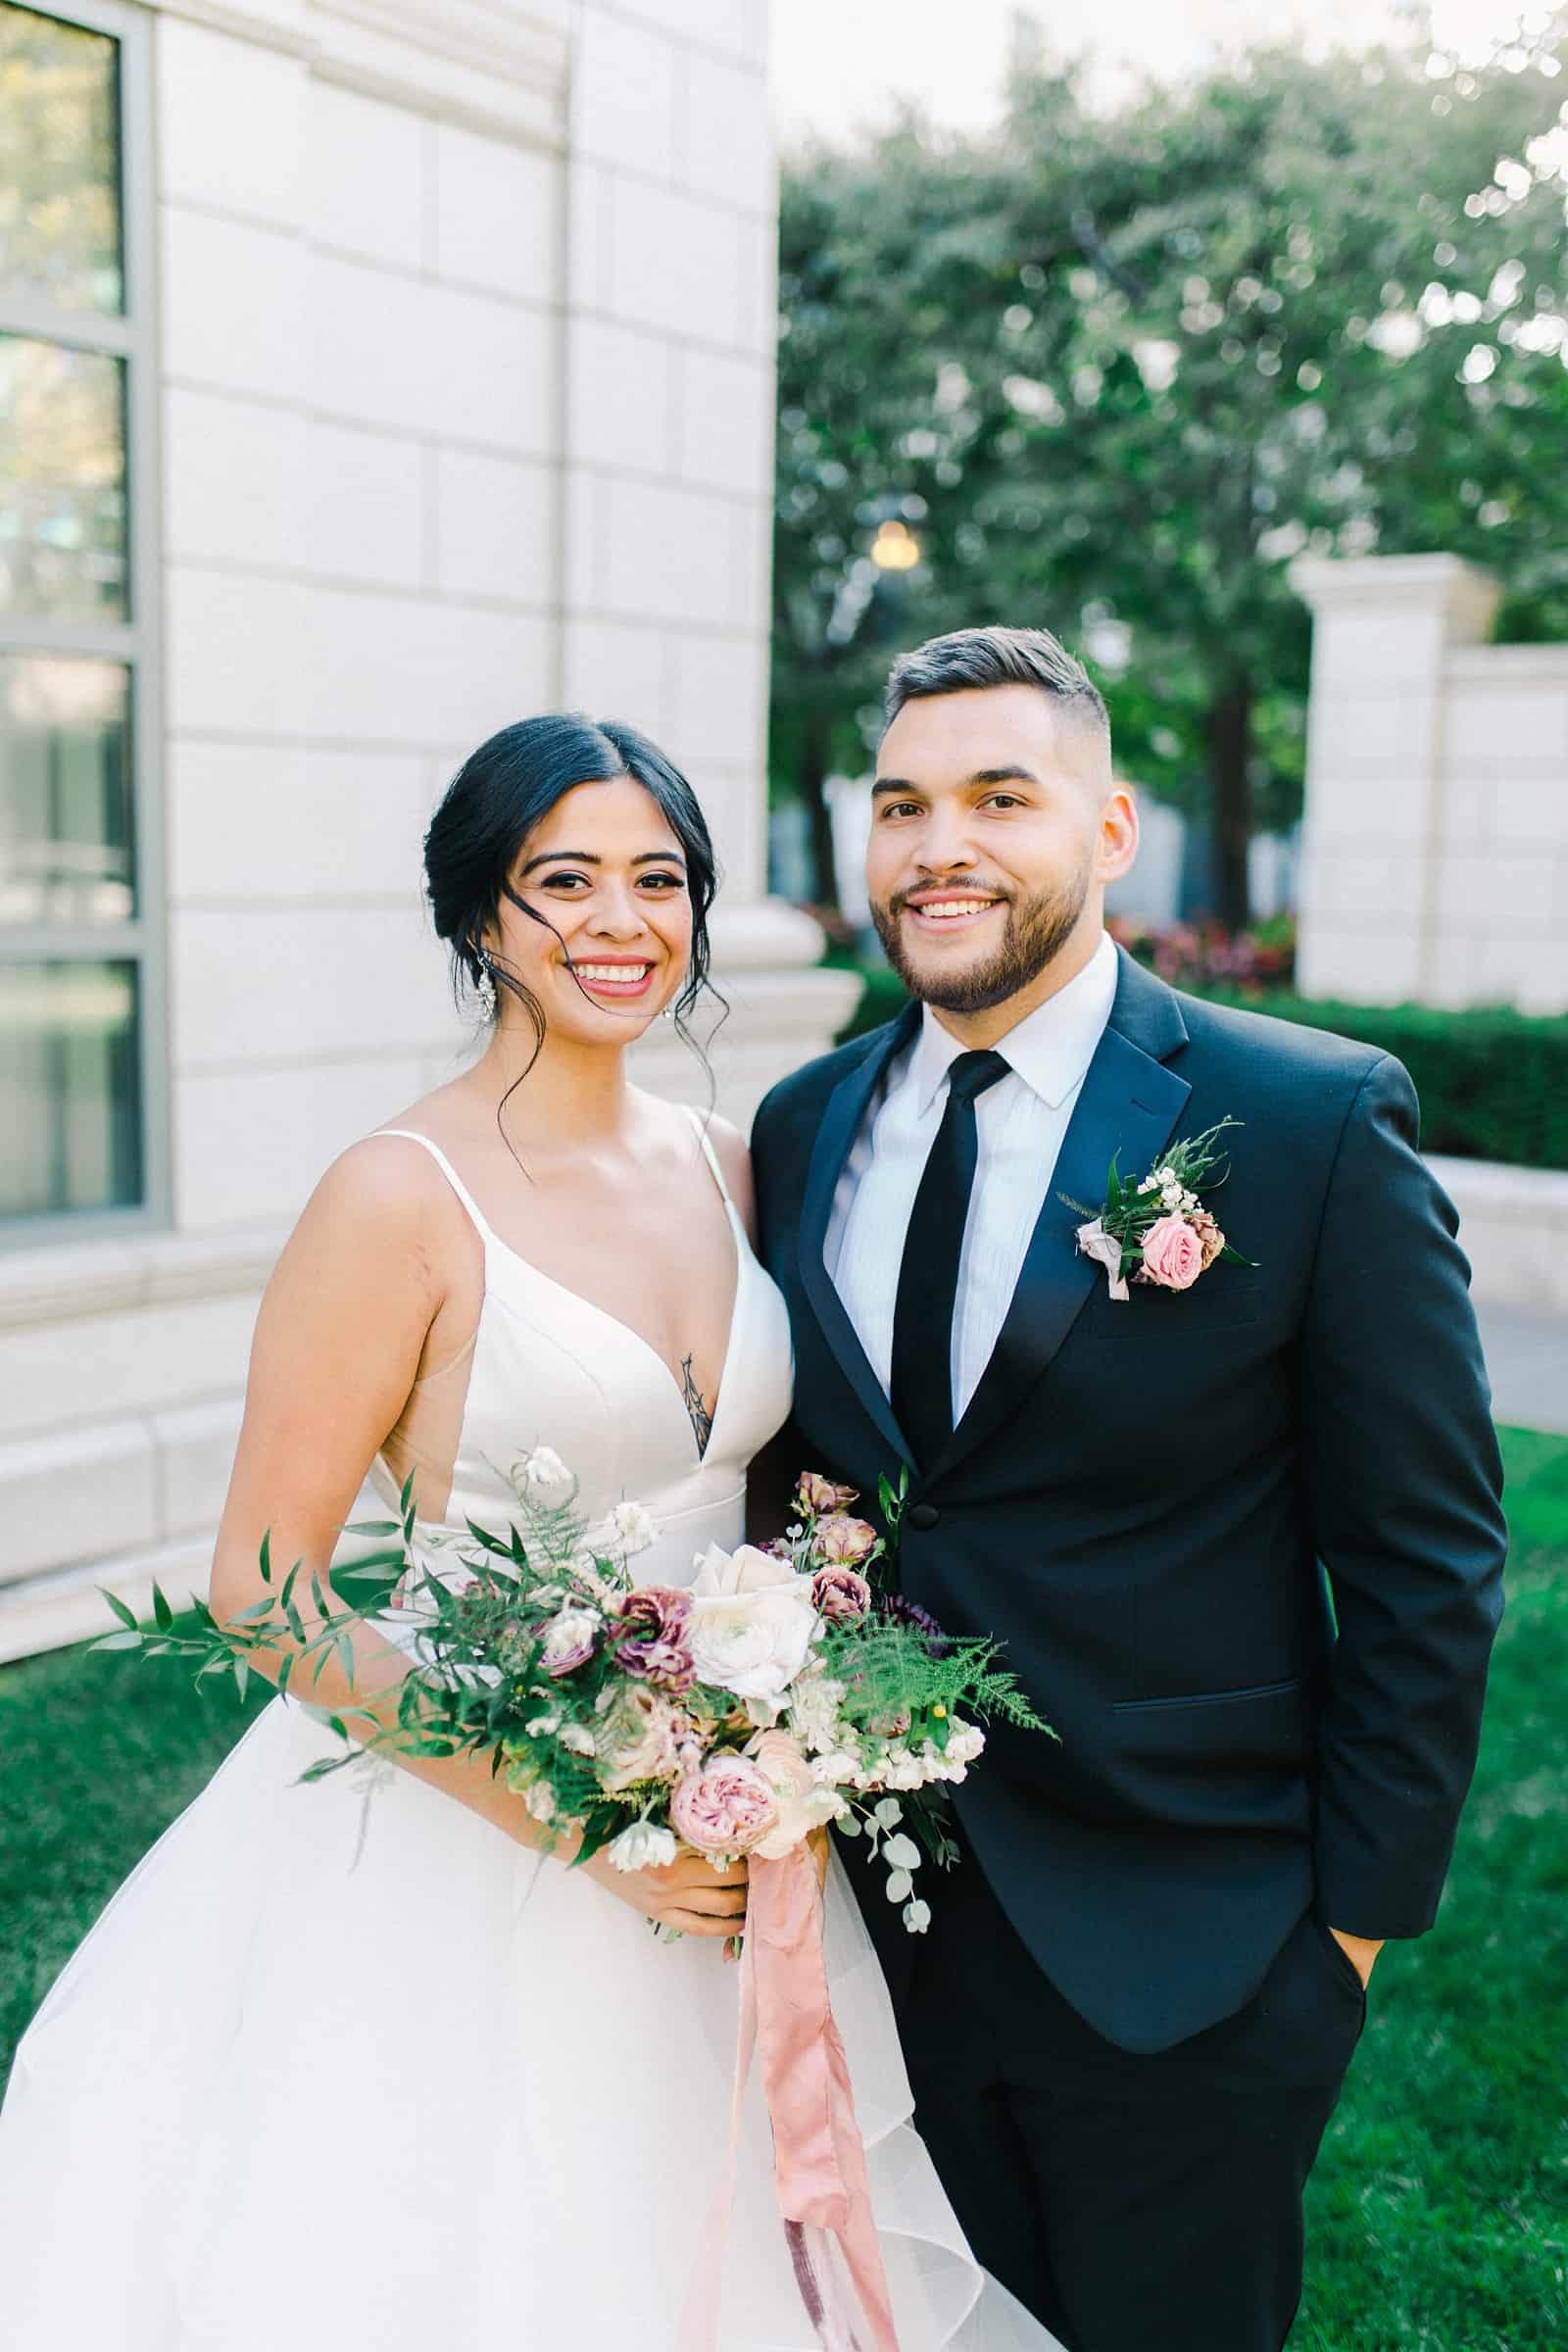 Happy bride and groom, utah wedding photographer